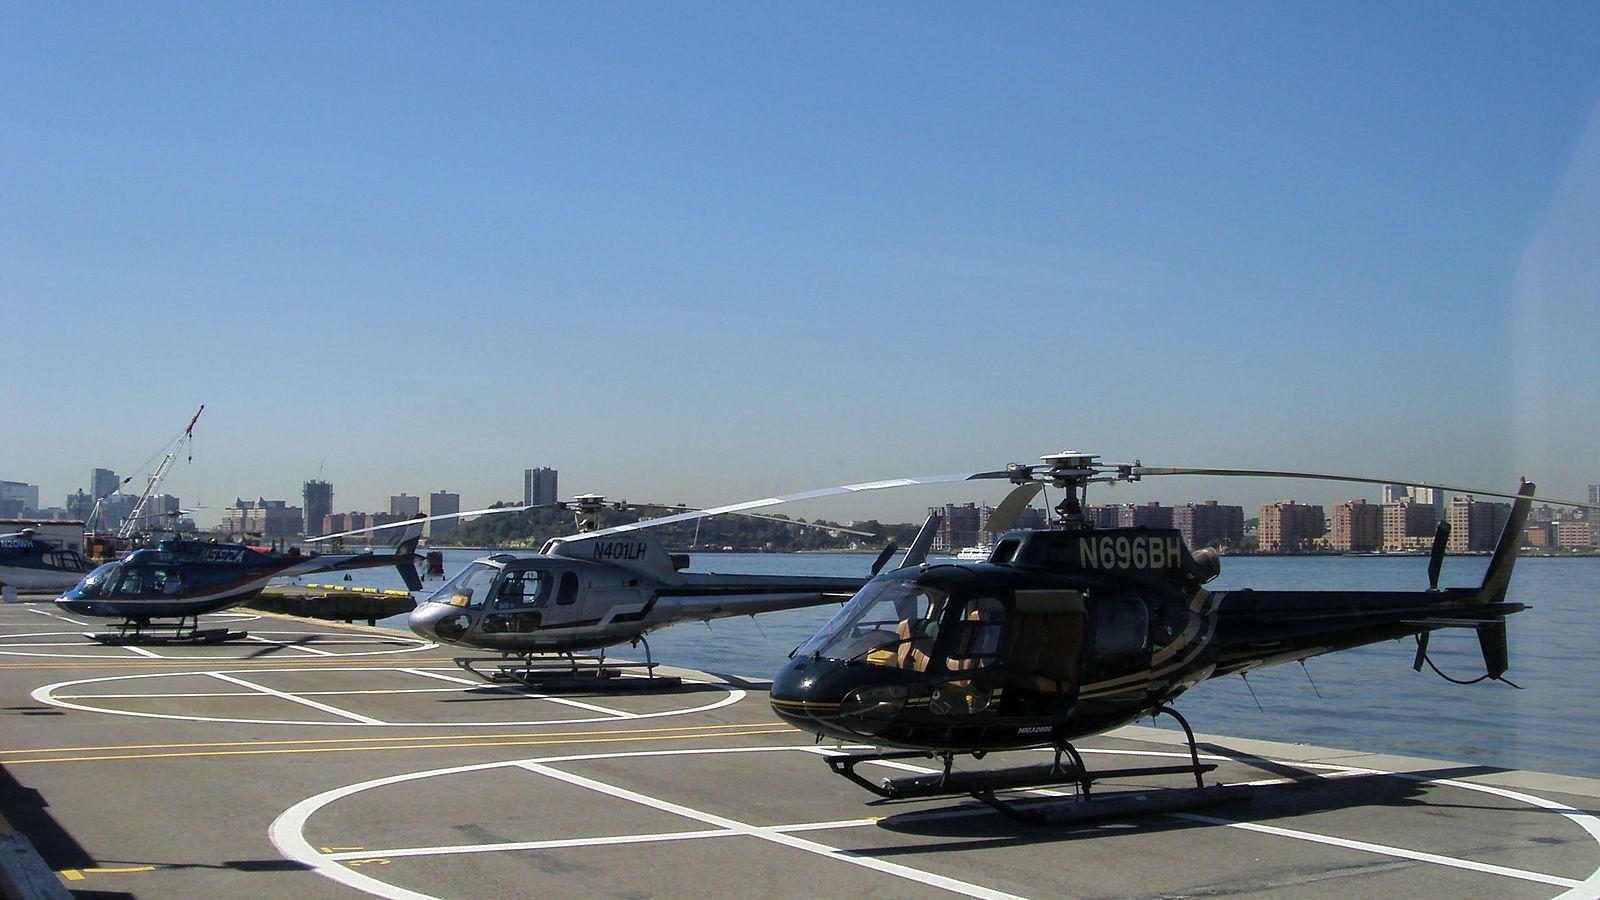 Tour hélicoptère New York héliport